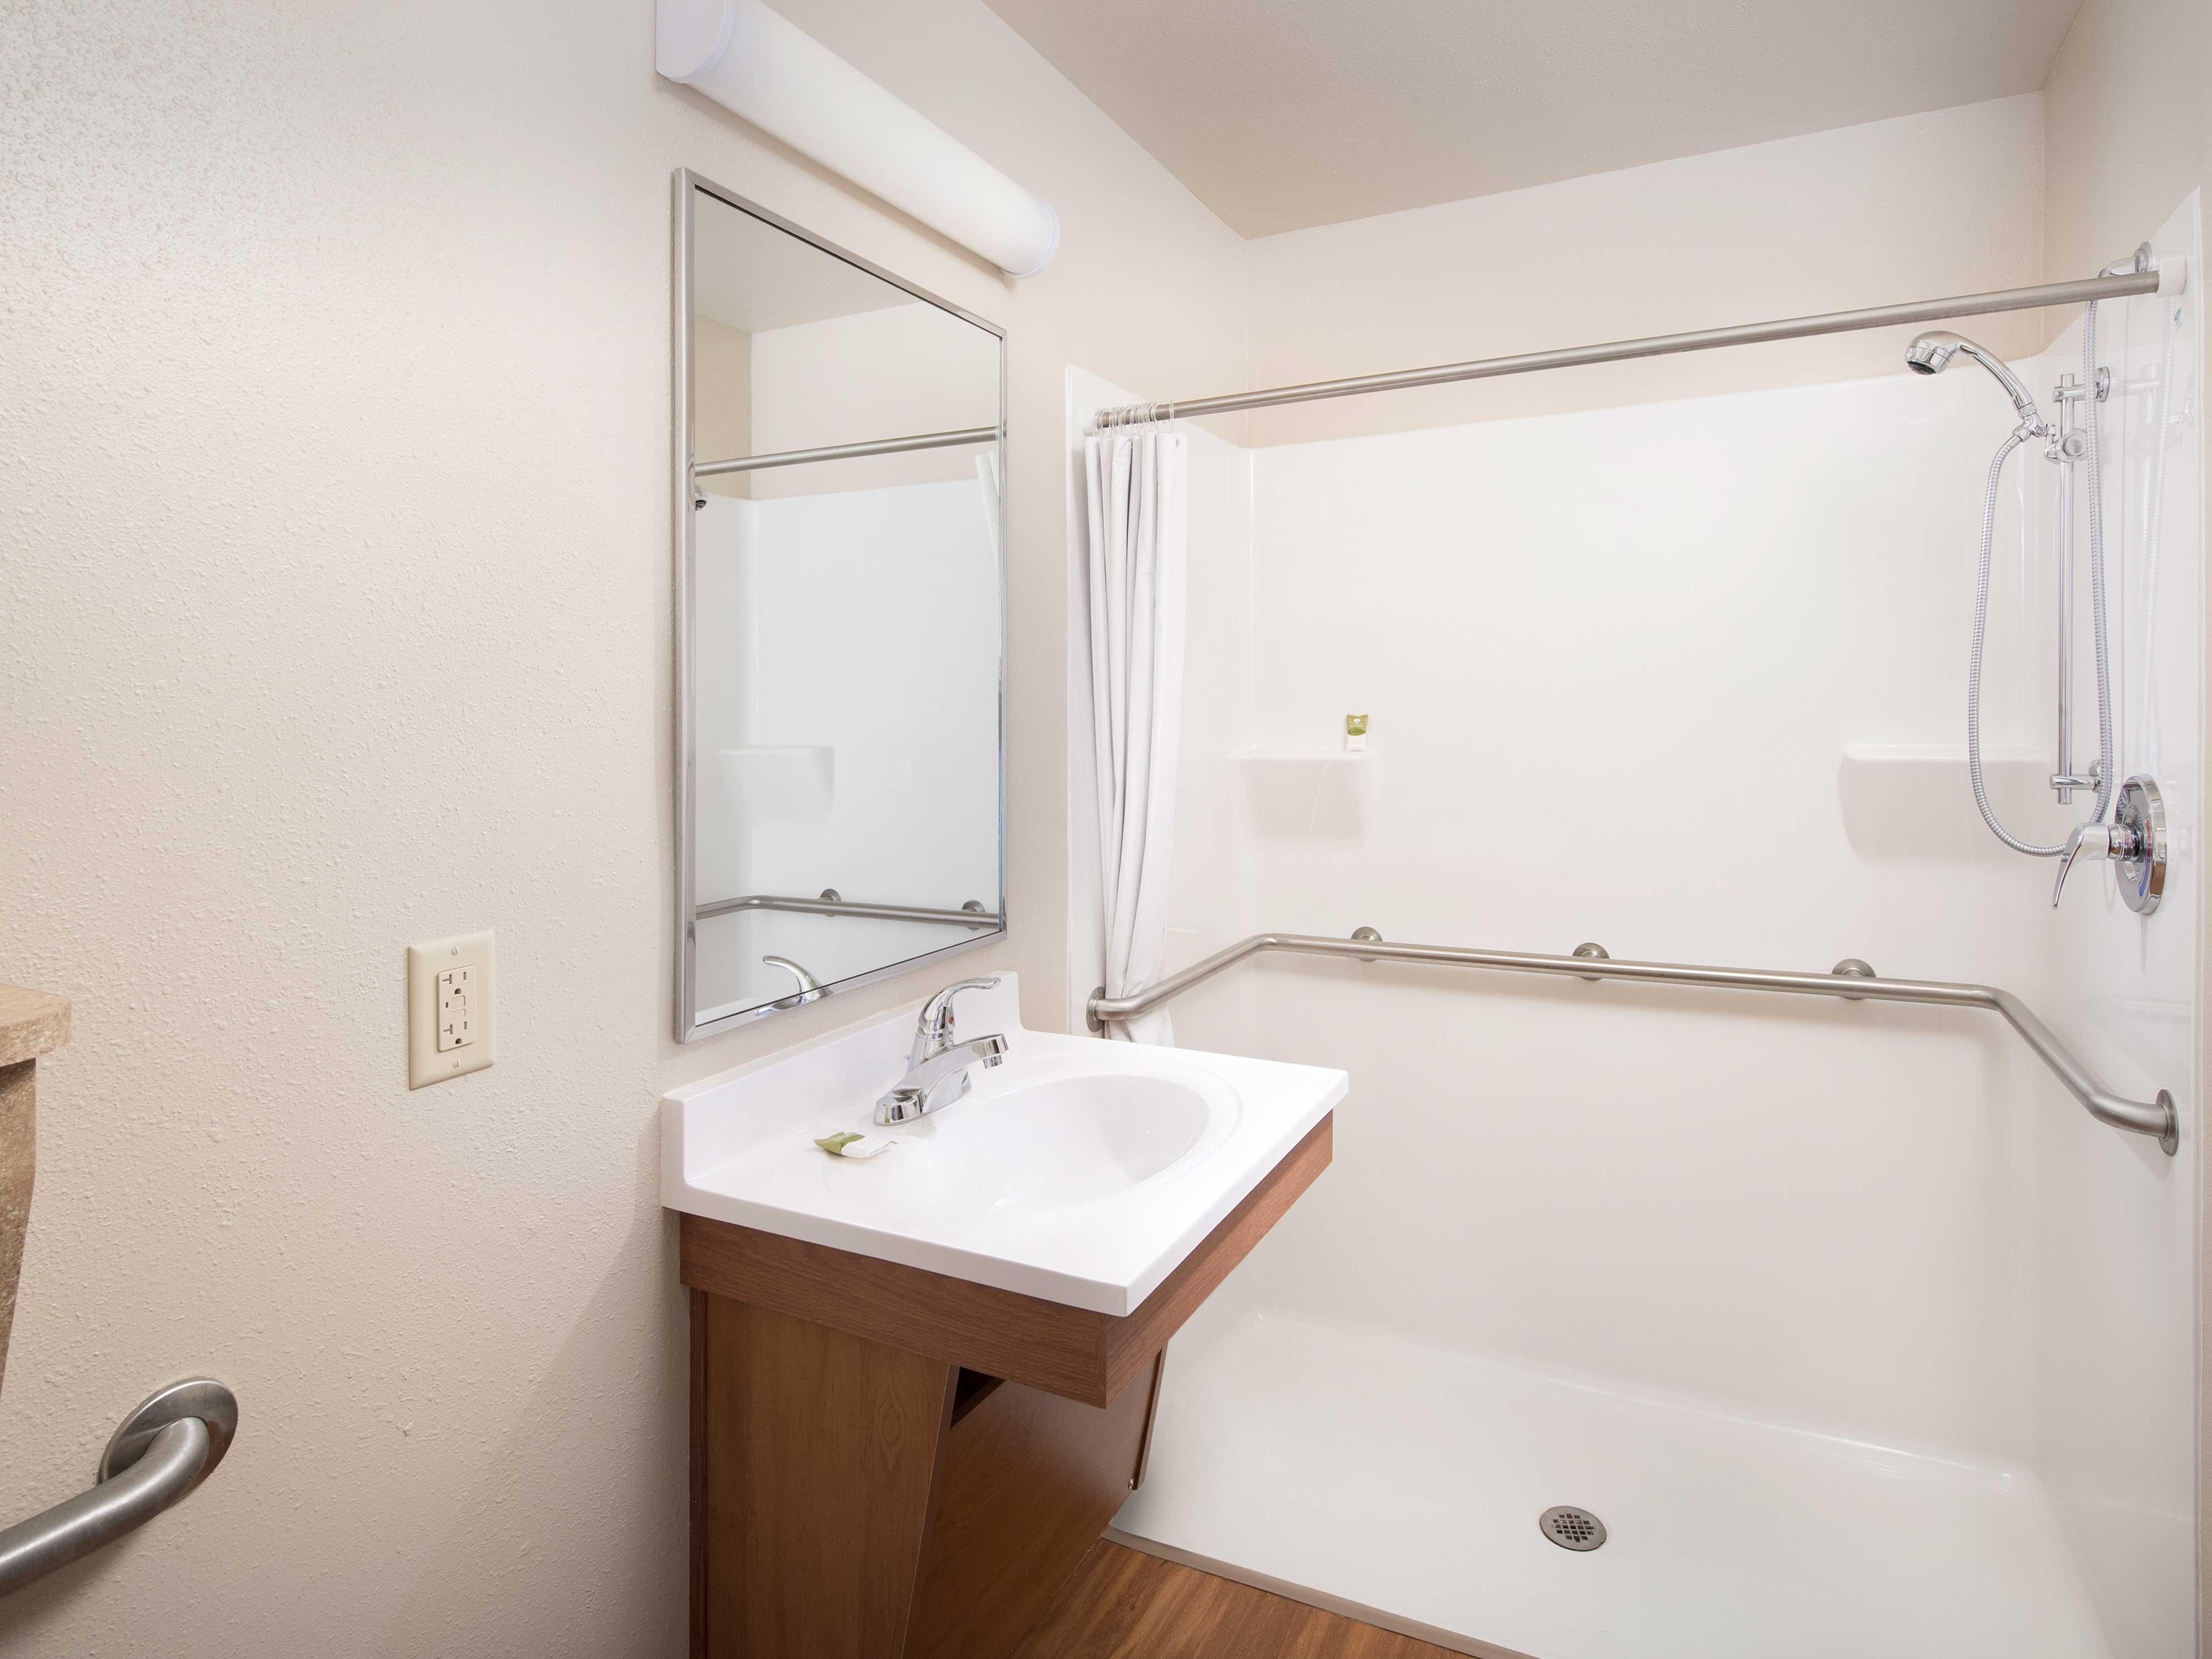 WoodSpring Suites Grand Rapids South image 22